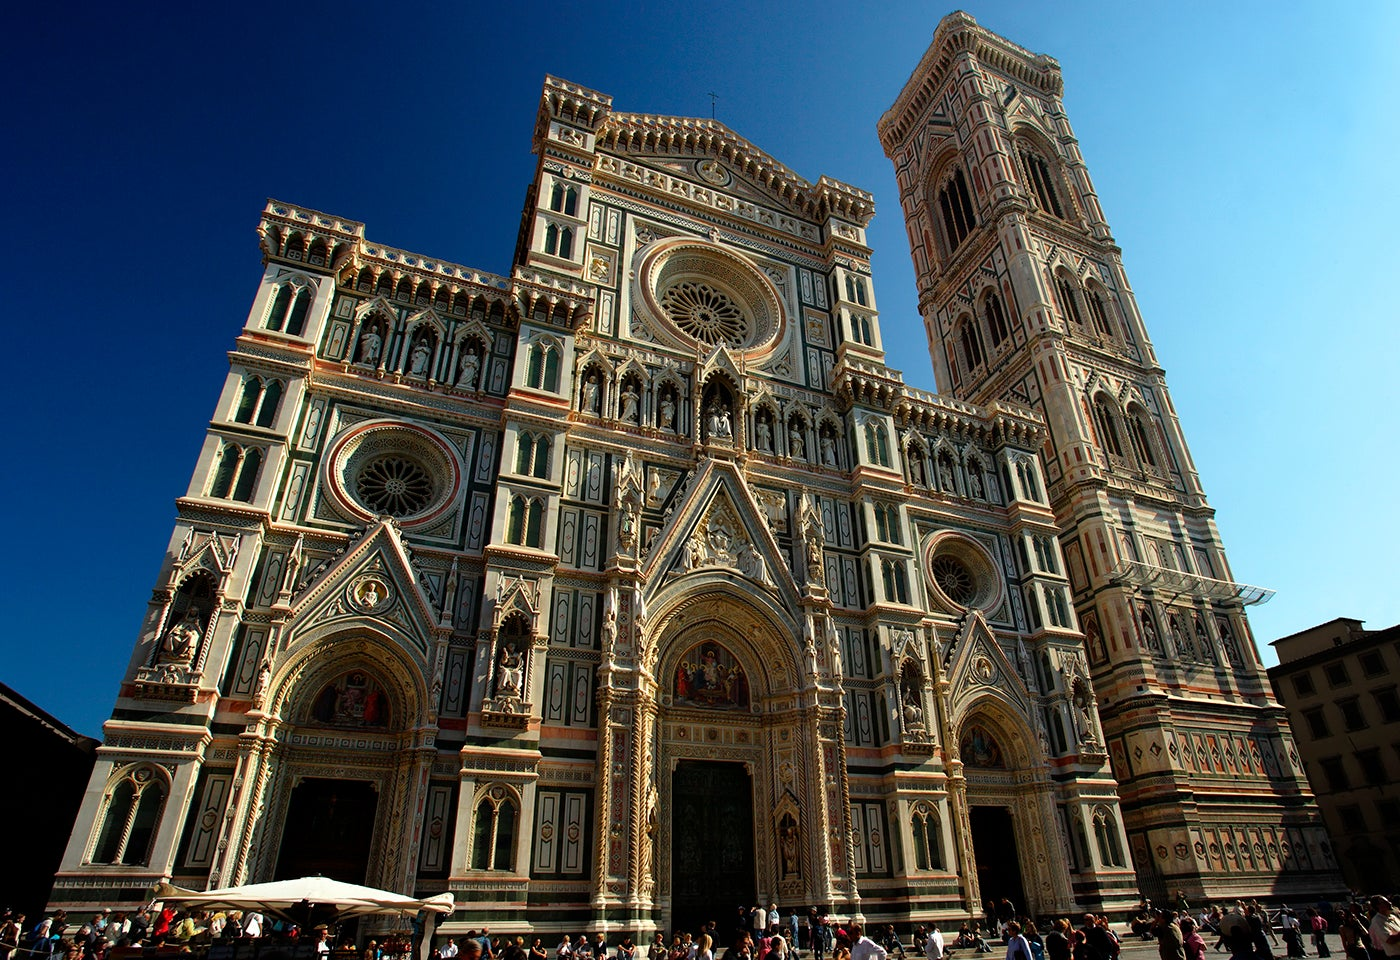 Lugares de interés en Florencia: catedral